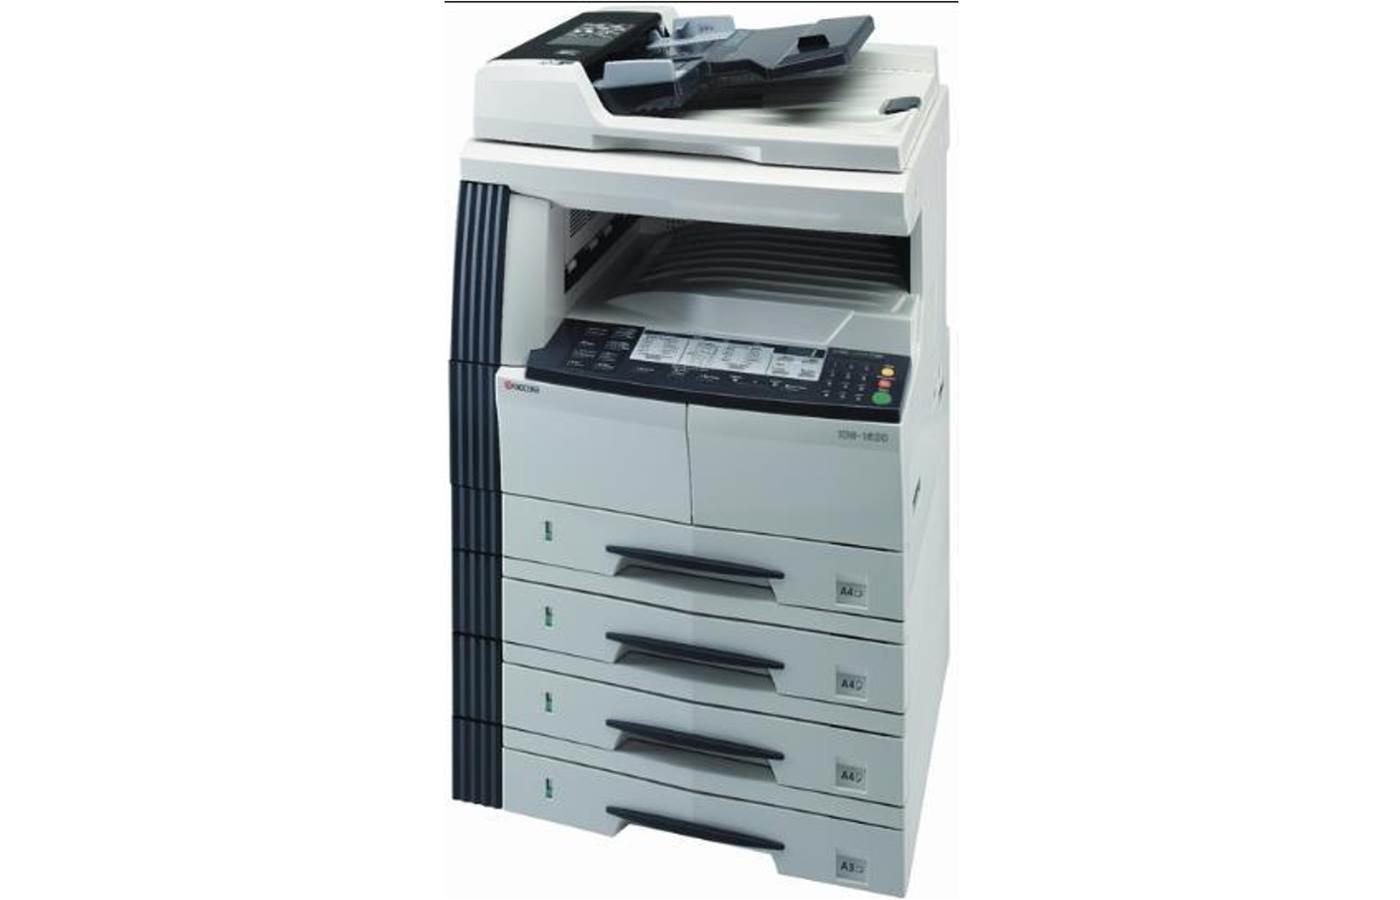 Kyocera recalls multifunctional printers due to fire hazard